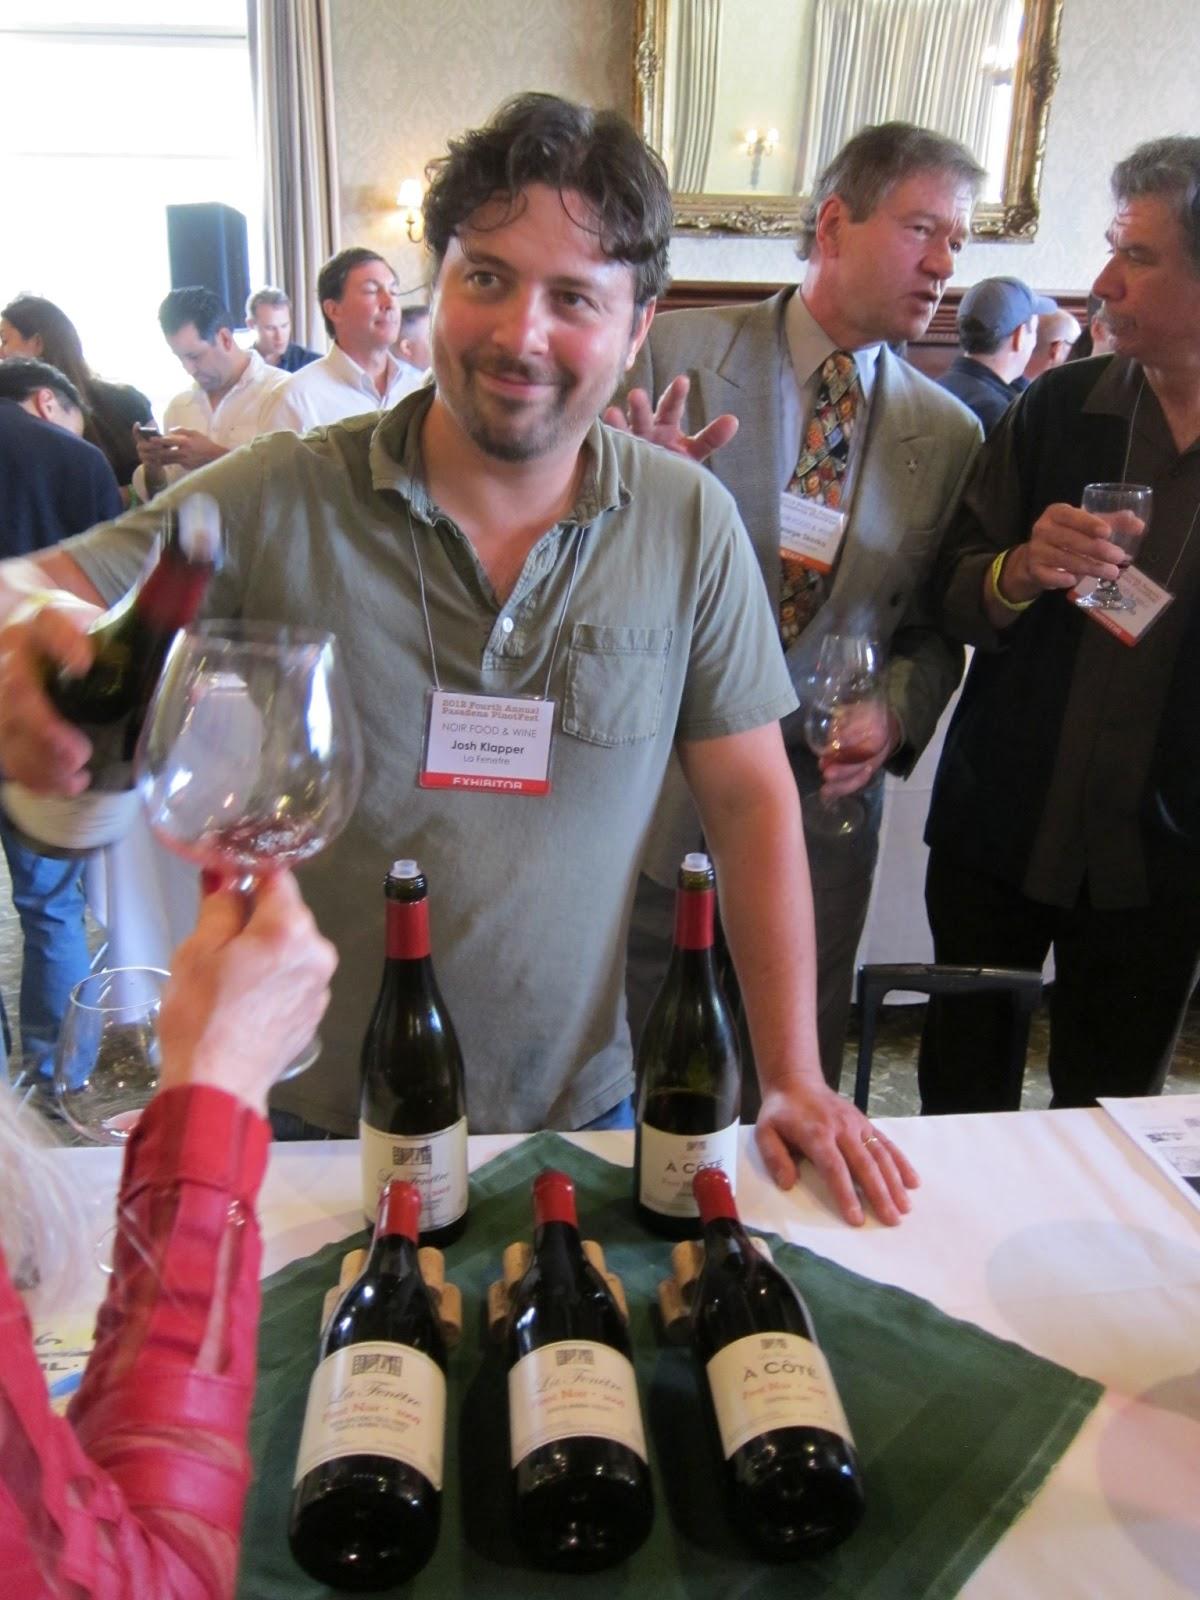 Gourmet pigs pasadena pinotfest returns feb 9 for La fenetre wine